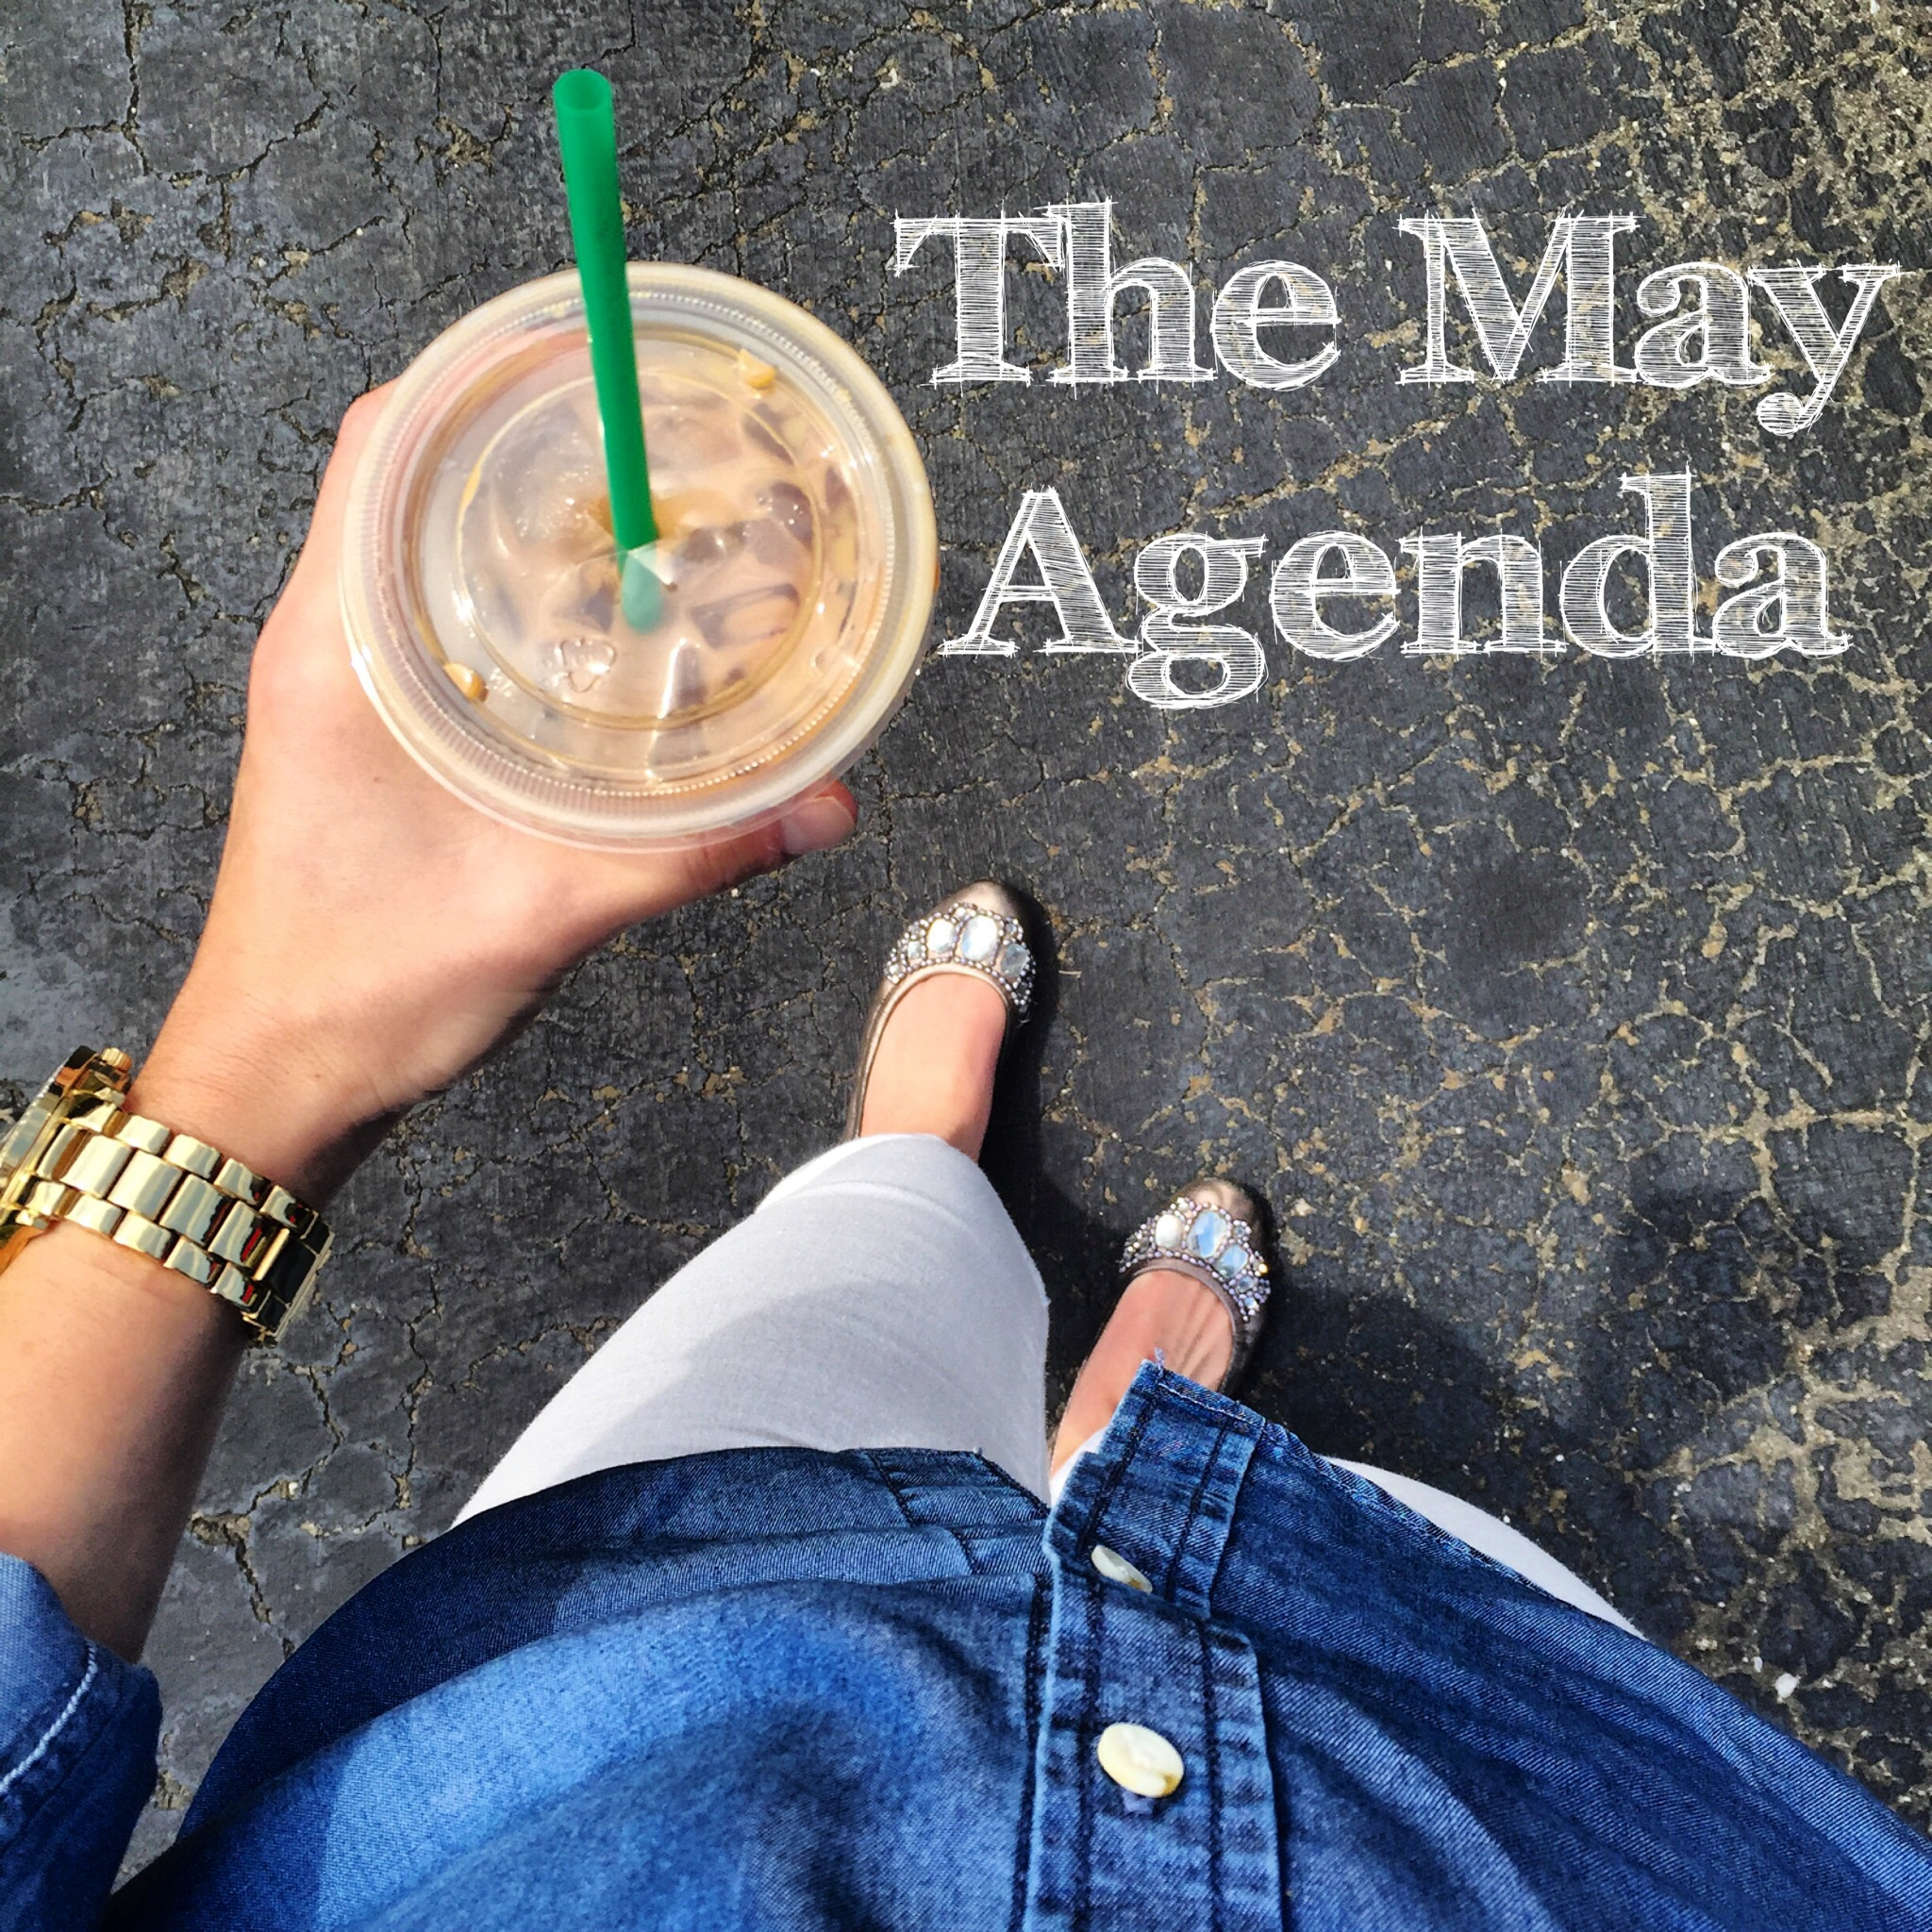 The May Agenda